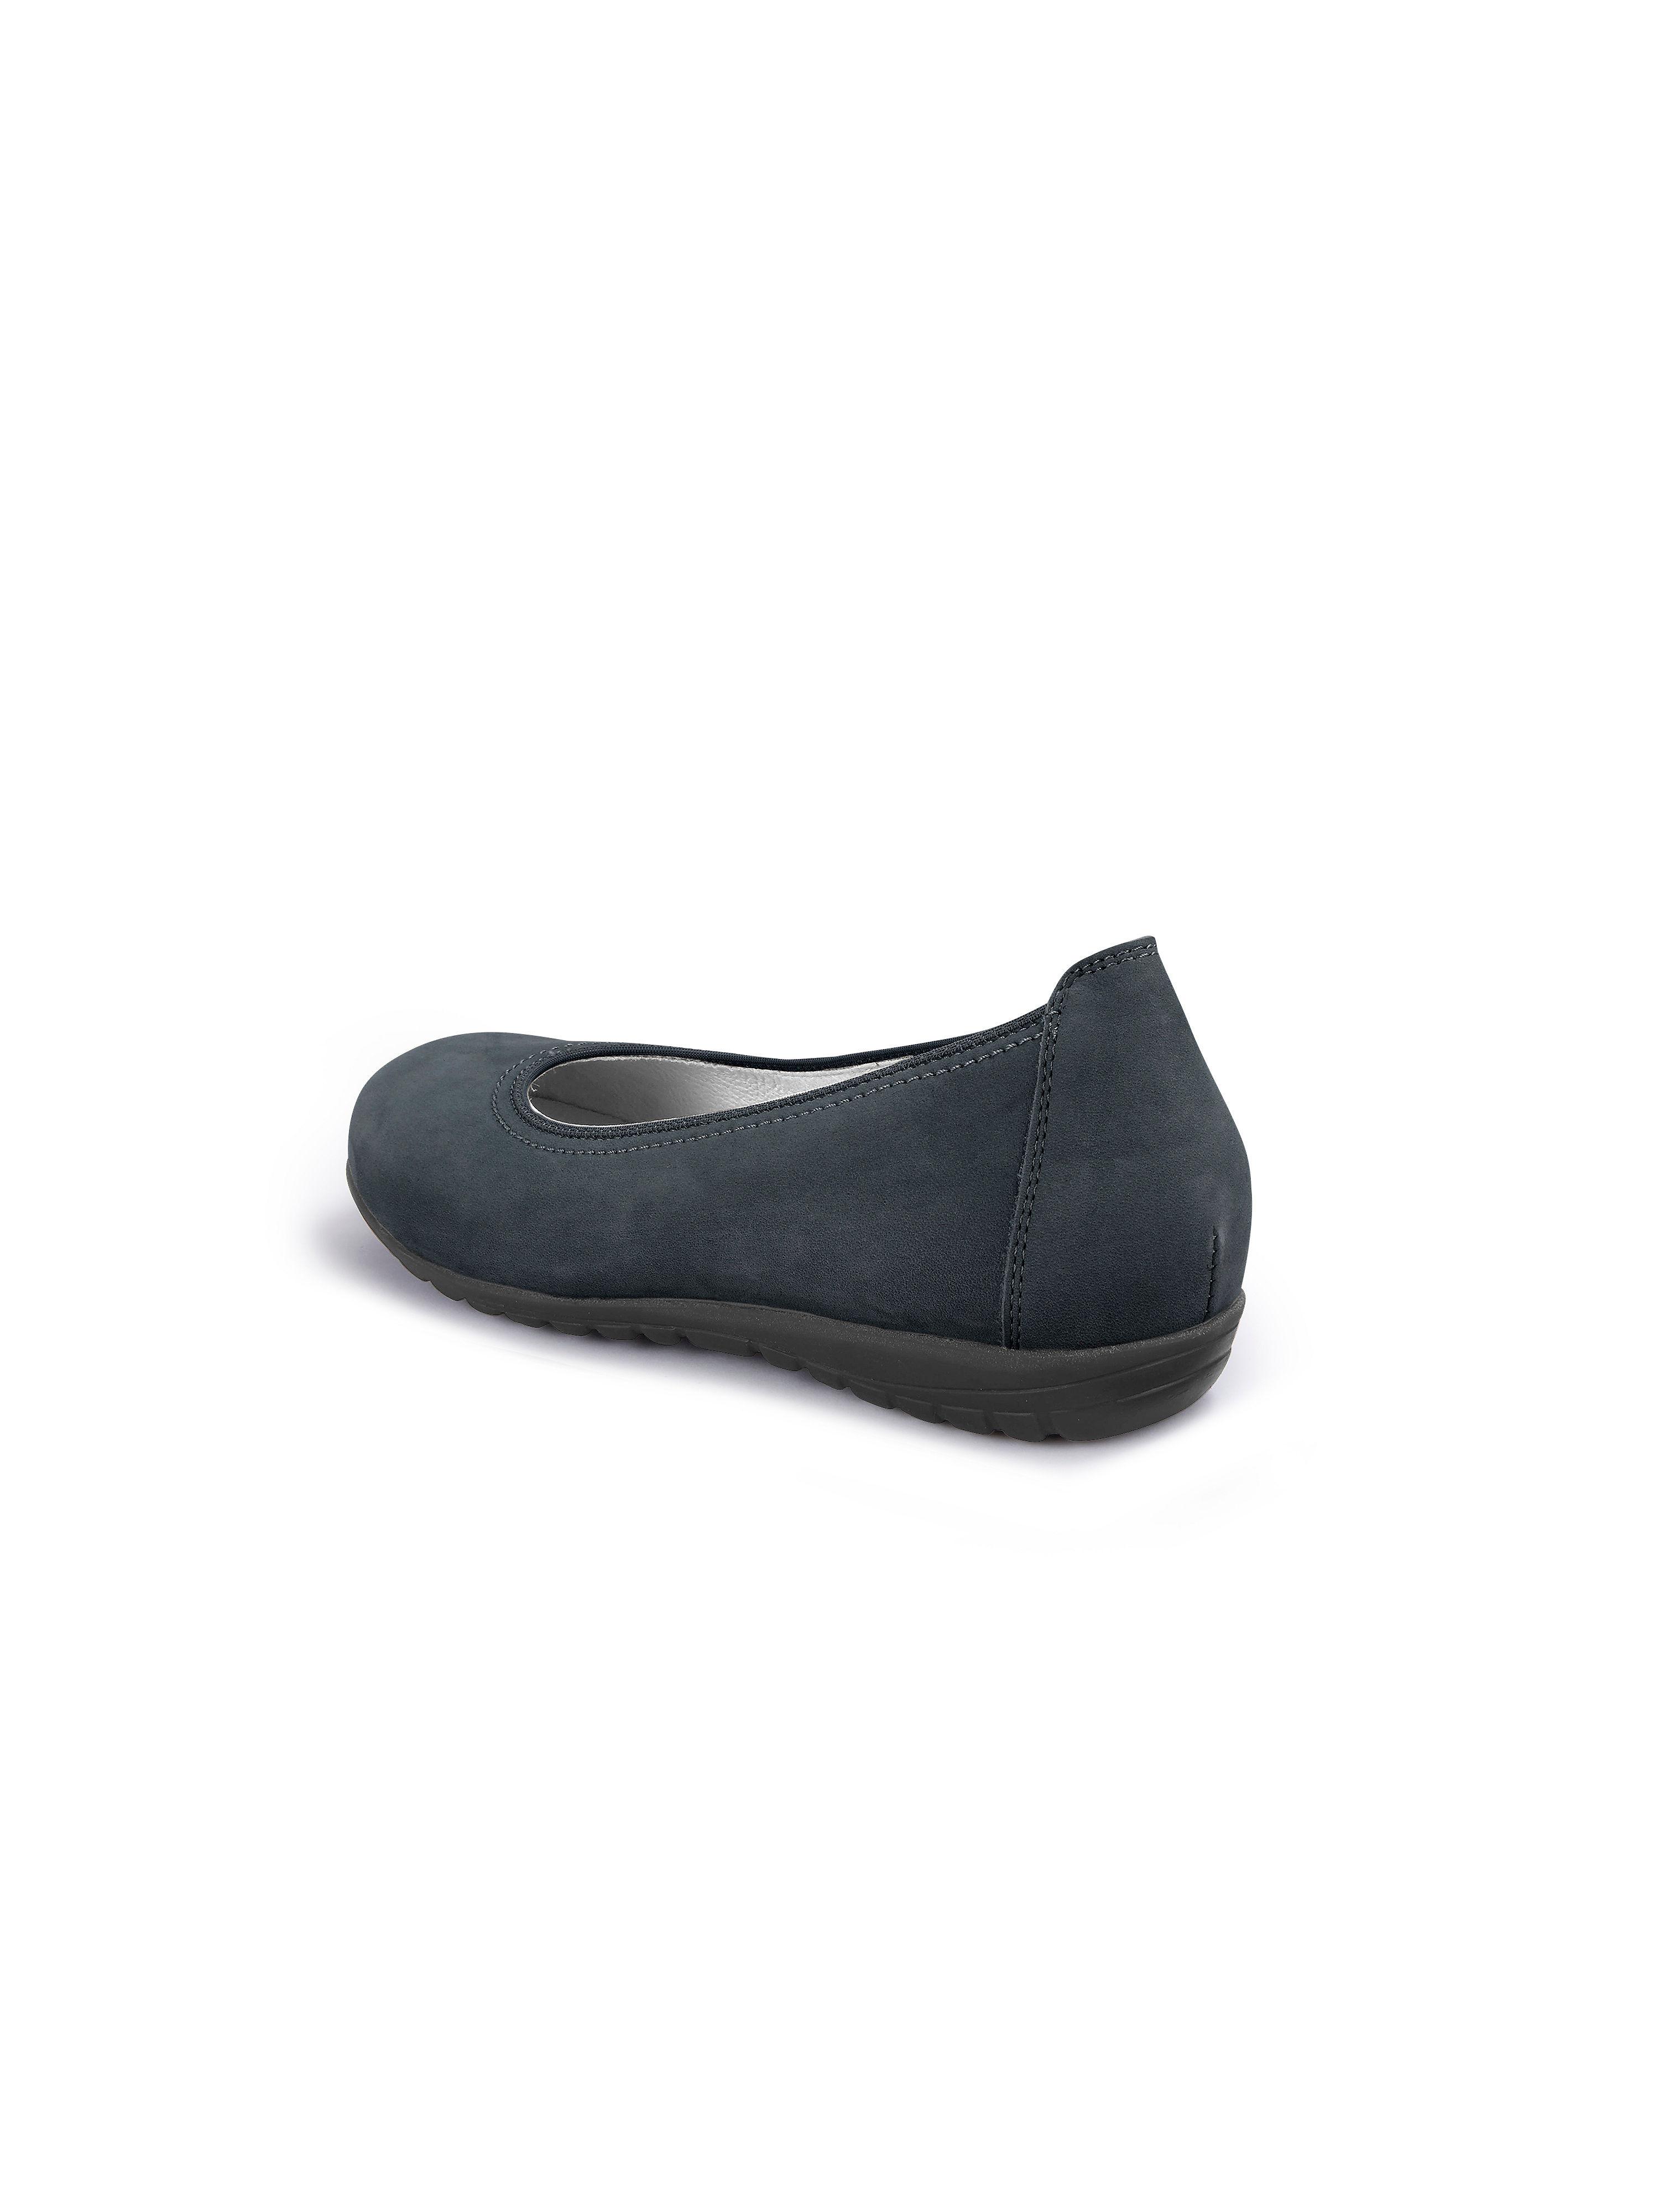 Waldläufer - Ballerina Hesima - - - Meerblau Gute Qualität beliebte Schuhe 8693e4